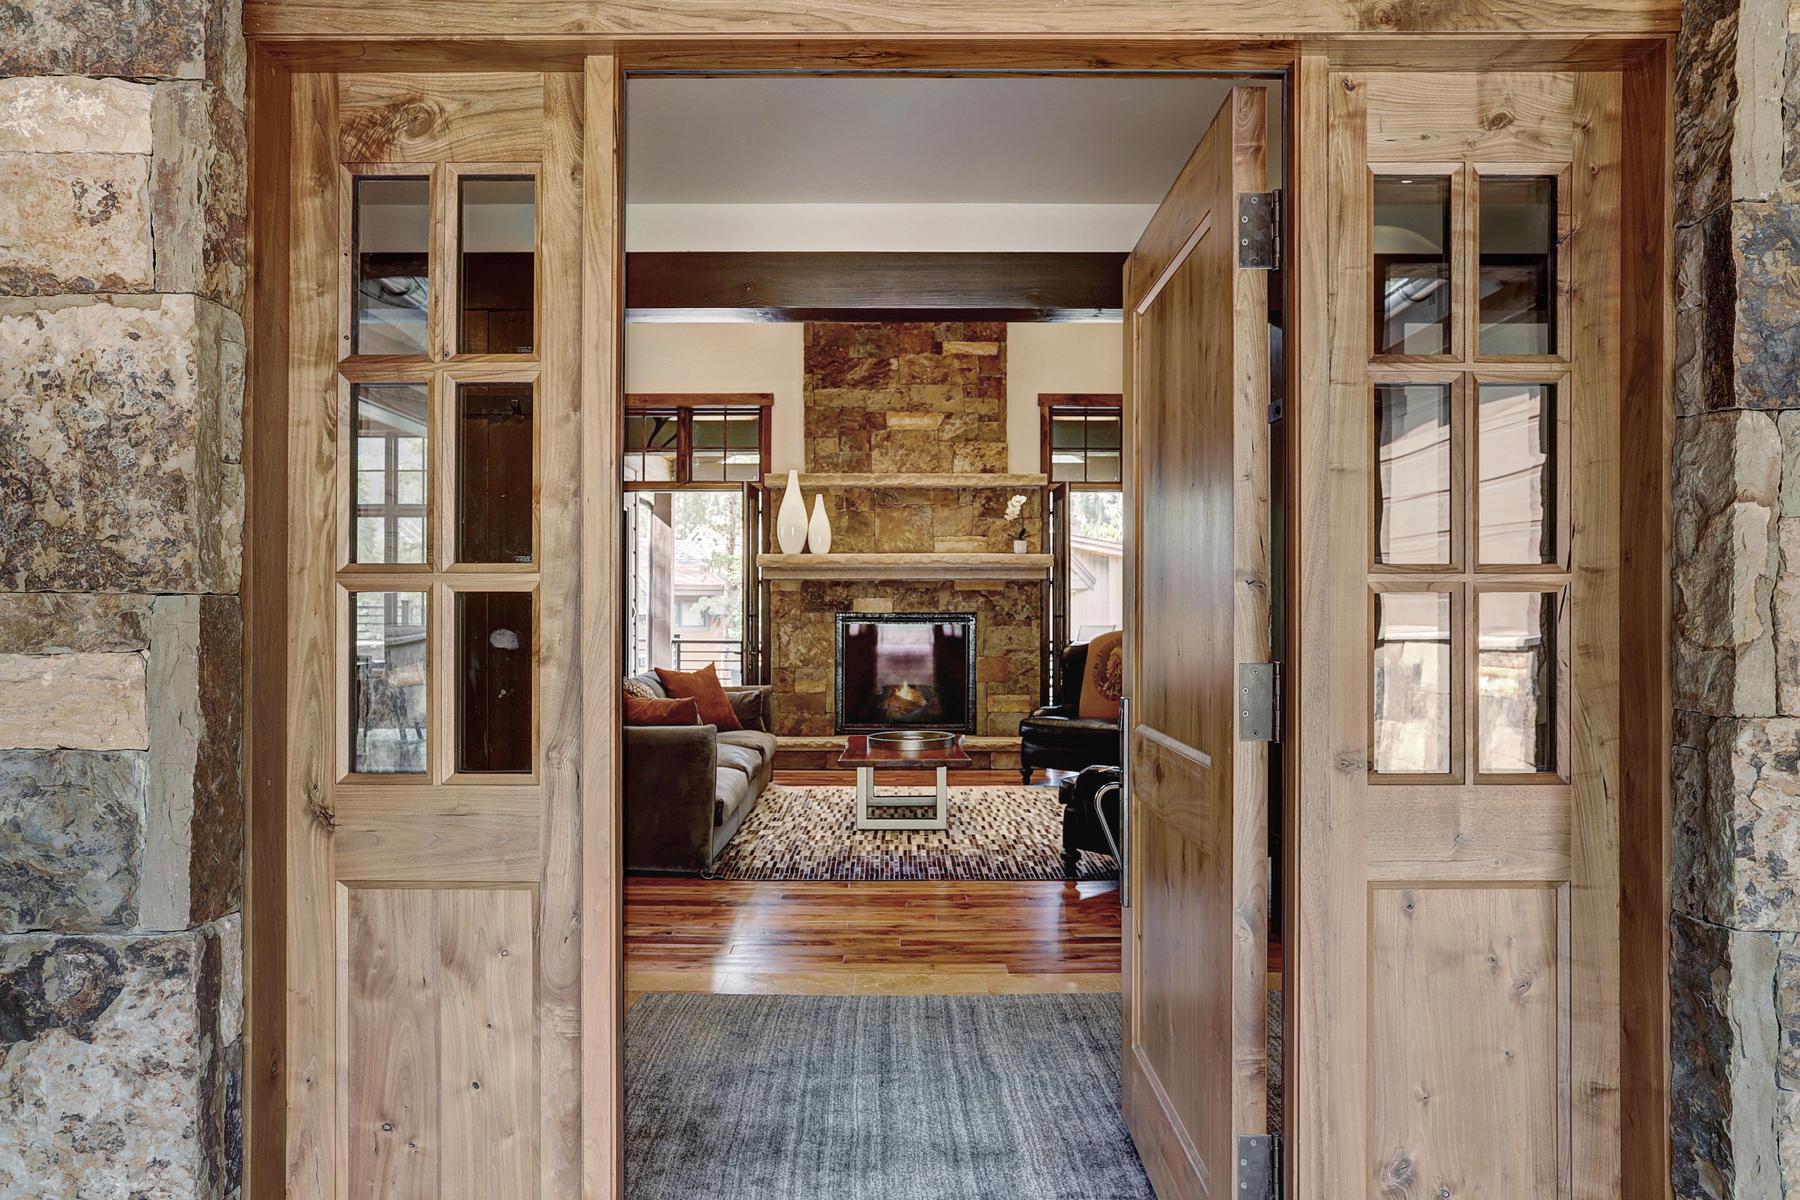 Single Family Home for Active at 59 E Trade Court 59 E Trade Court Keystone, Colorado 80435 United States